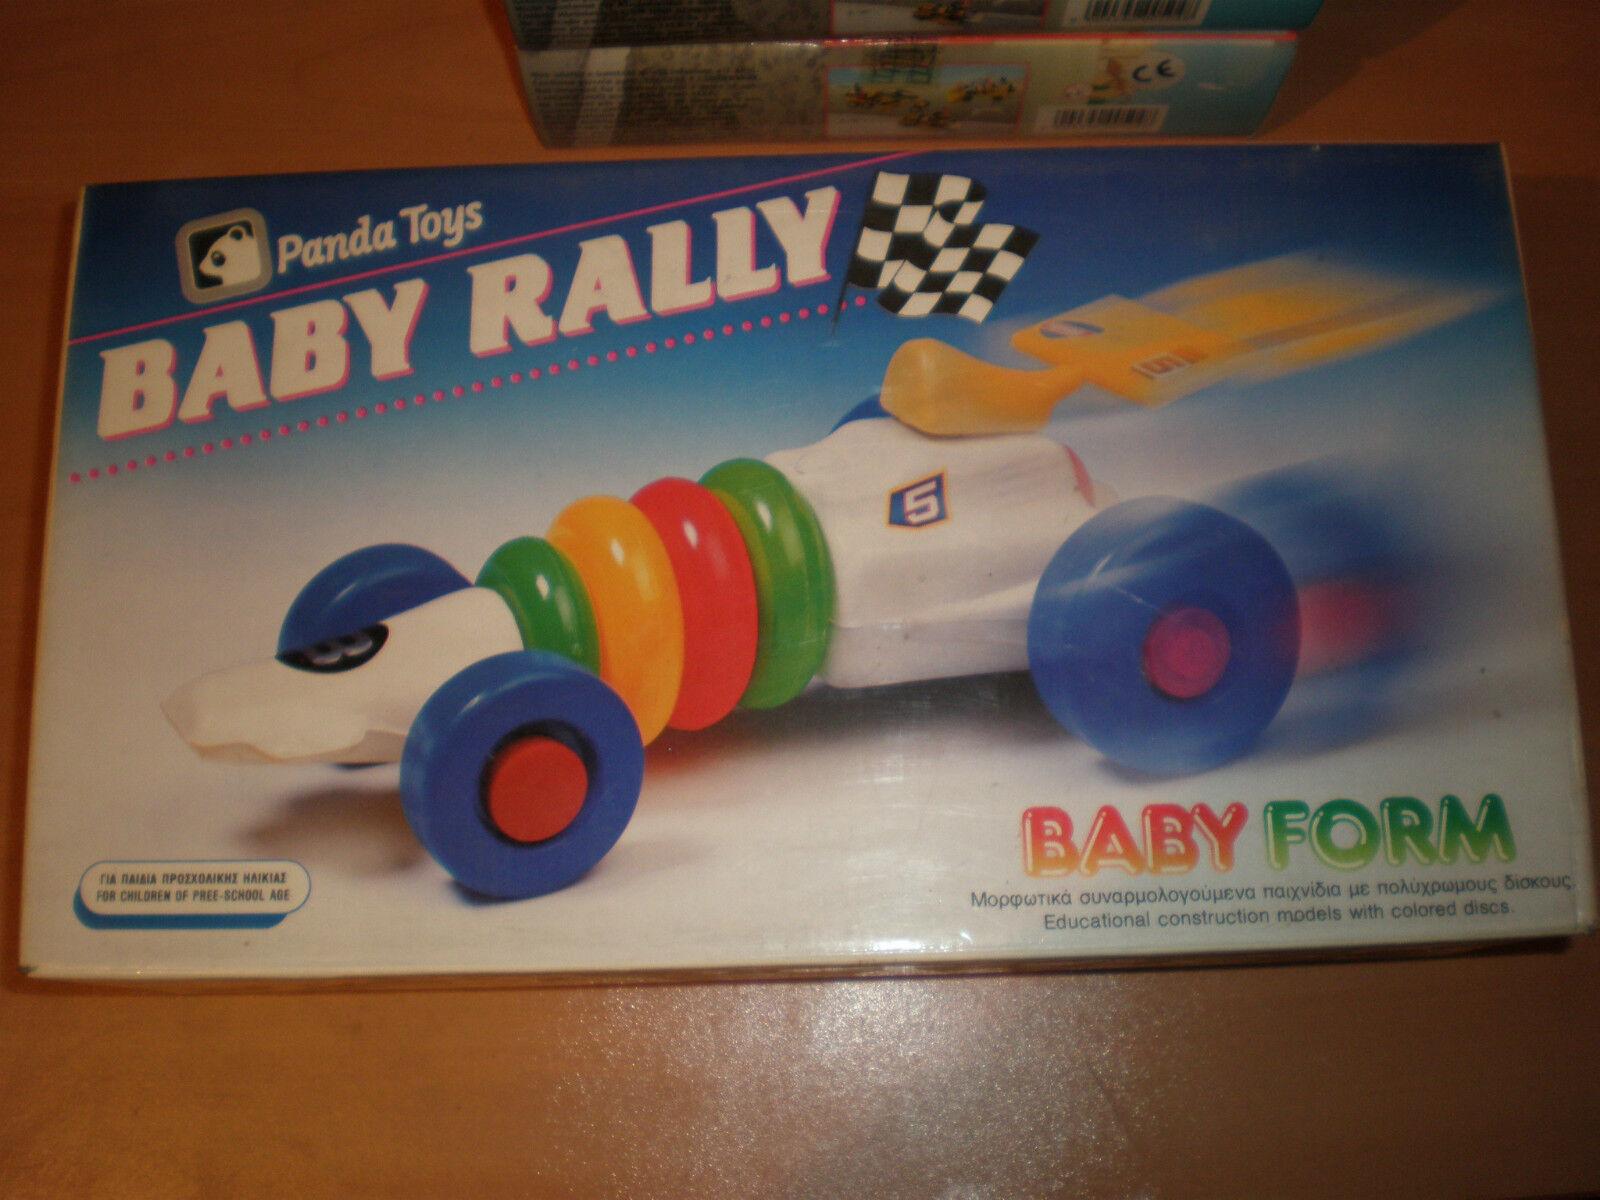 80'S GREEK BUILDING TOY PANDA BABY RALLY RACE CAR PYRAMID MIB